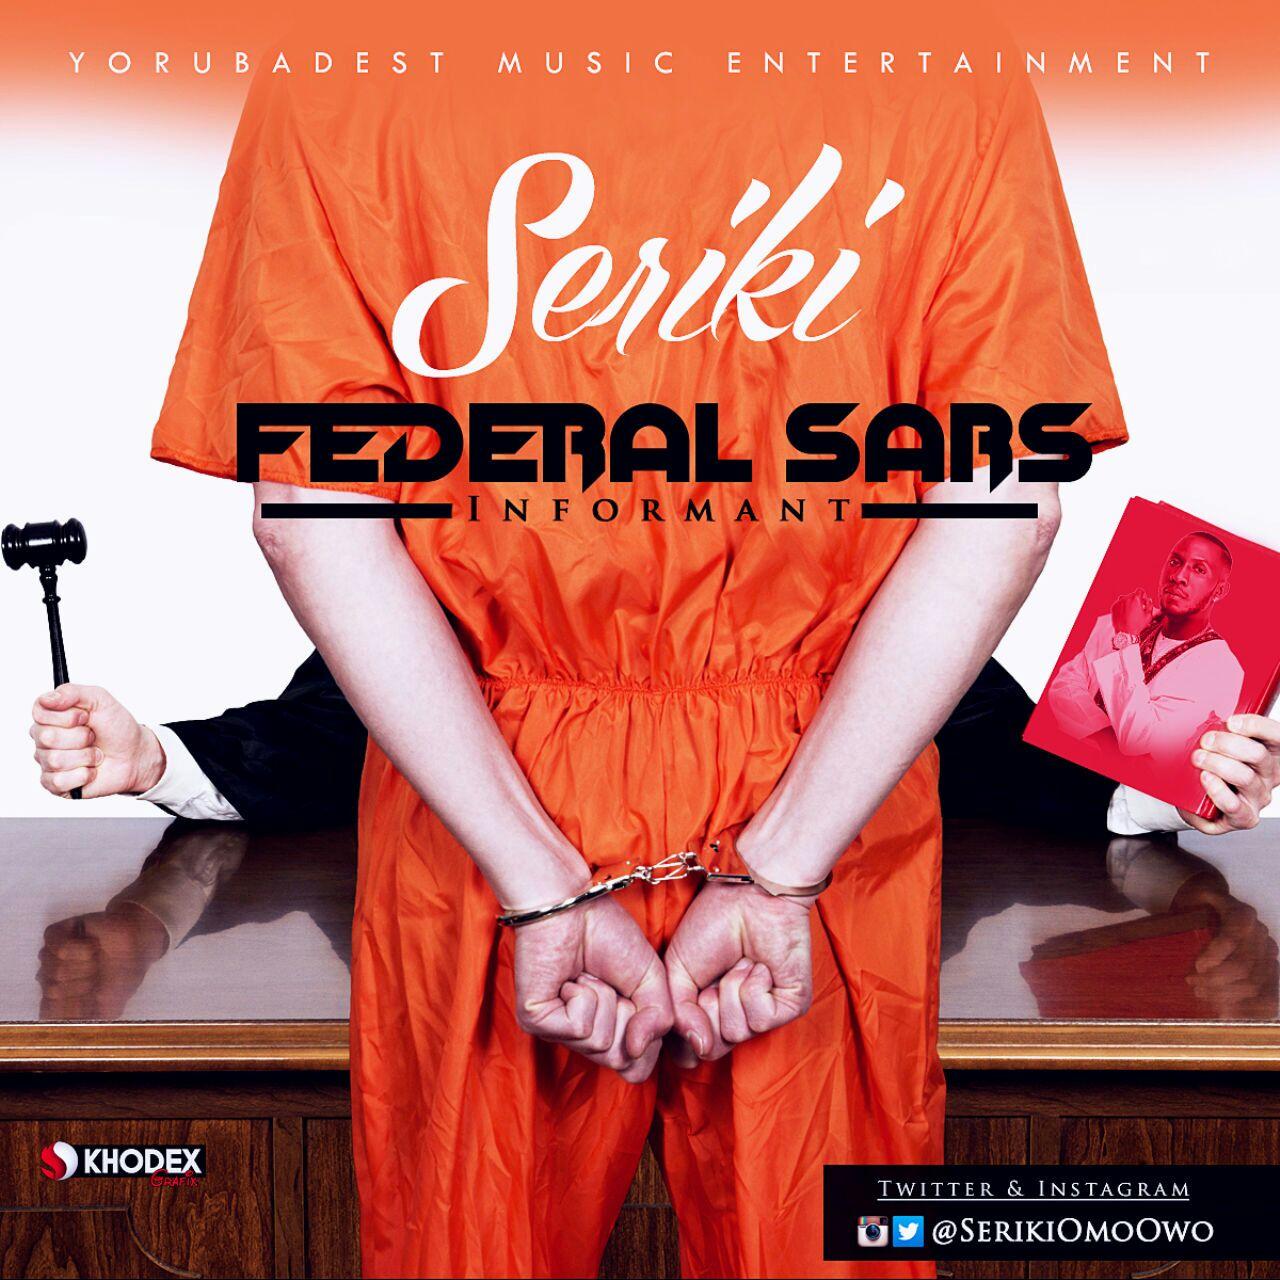 Seriki - Federal Sars (Informant)